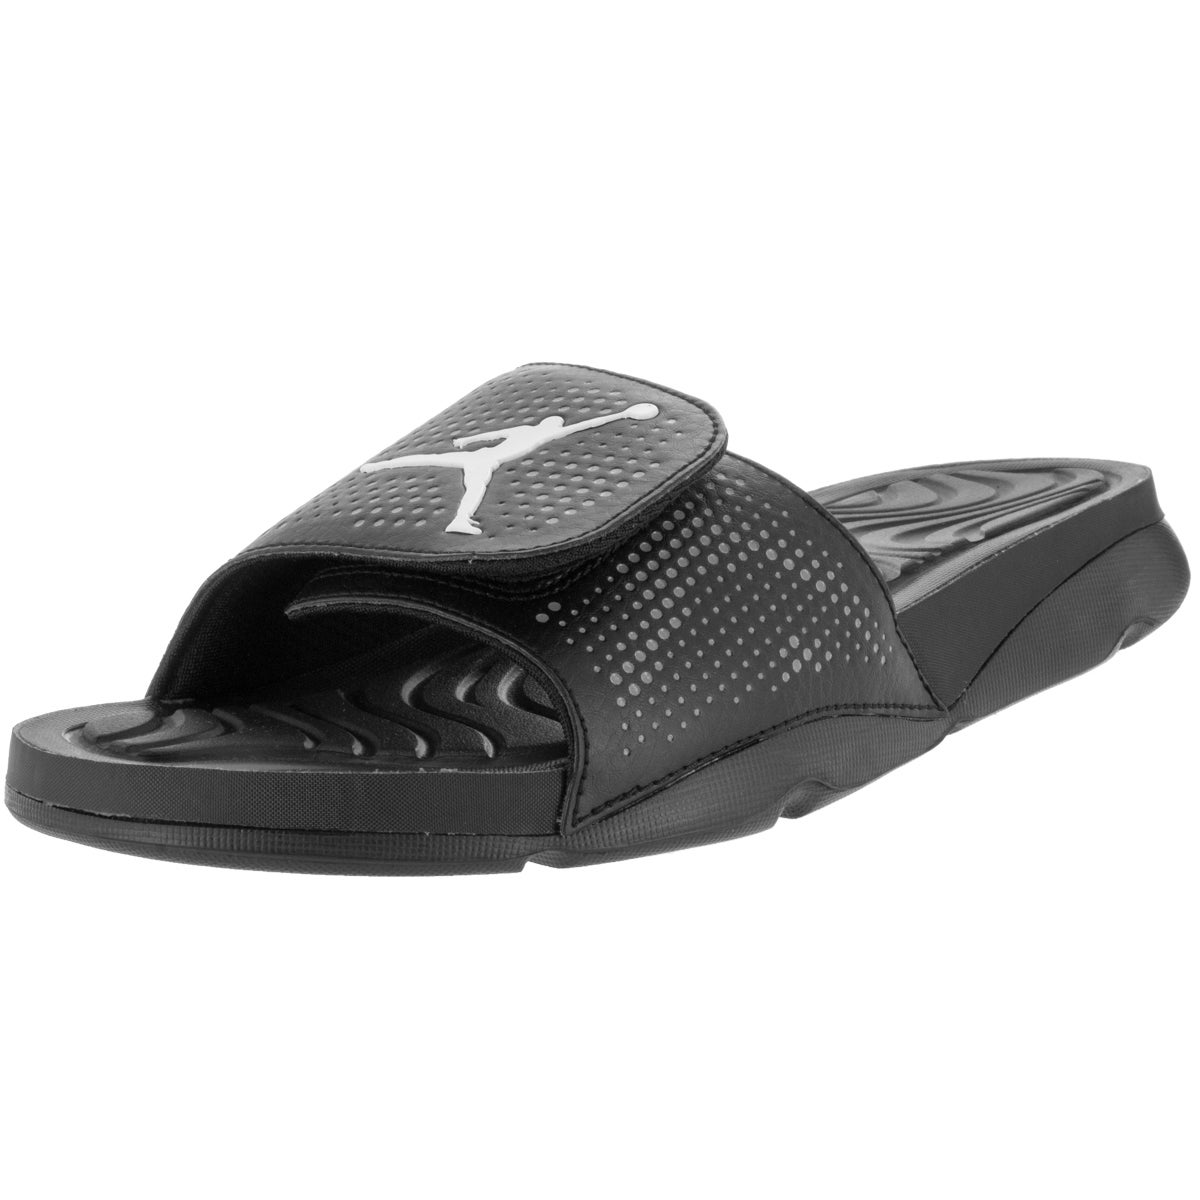 64925f9b18f Shop Nike Jordan Men's Jordan Hydro 5 Sandal - Free Shipping Today -  Overstock - 12318203